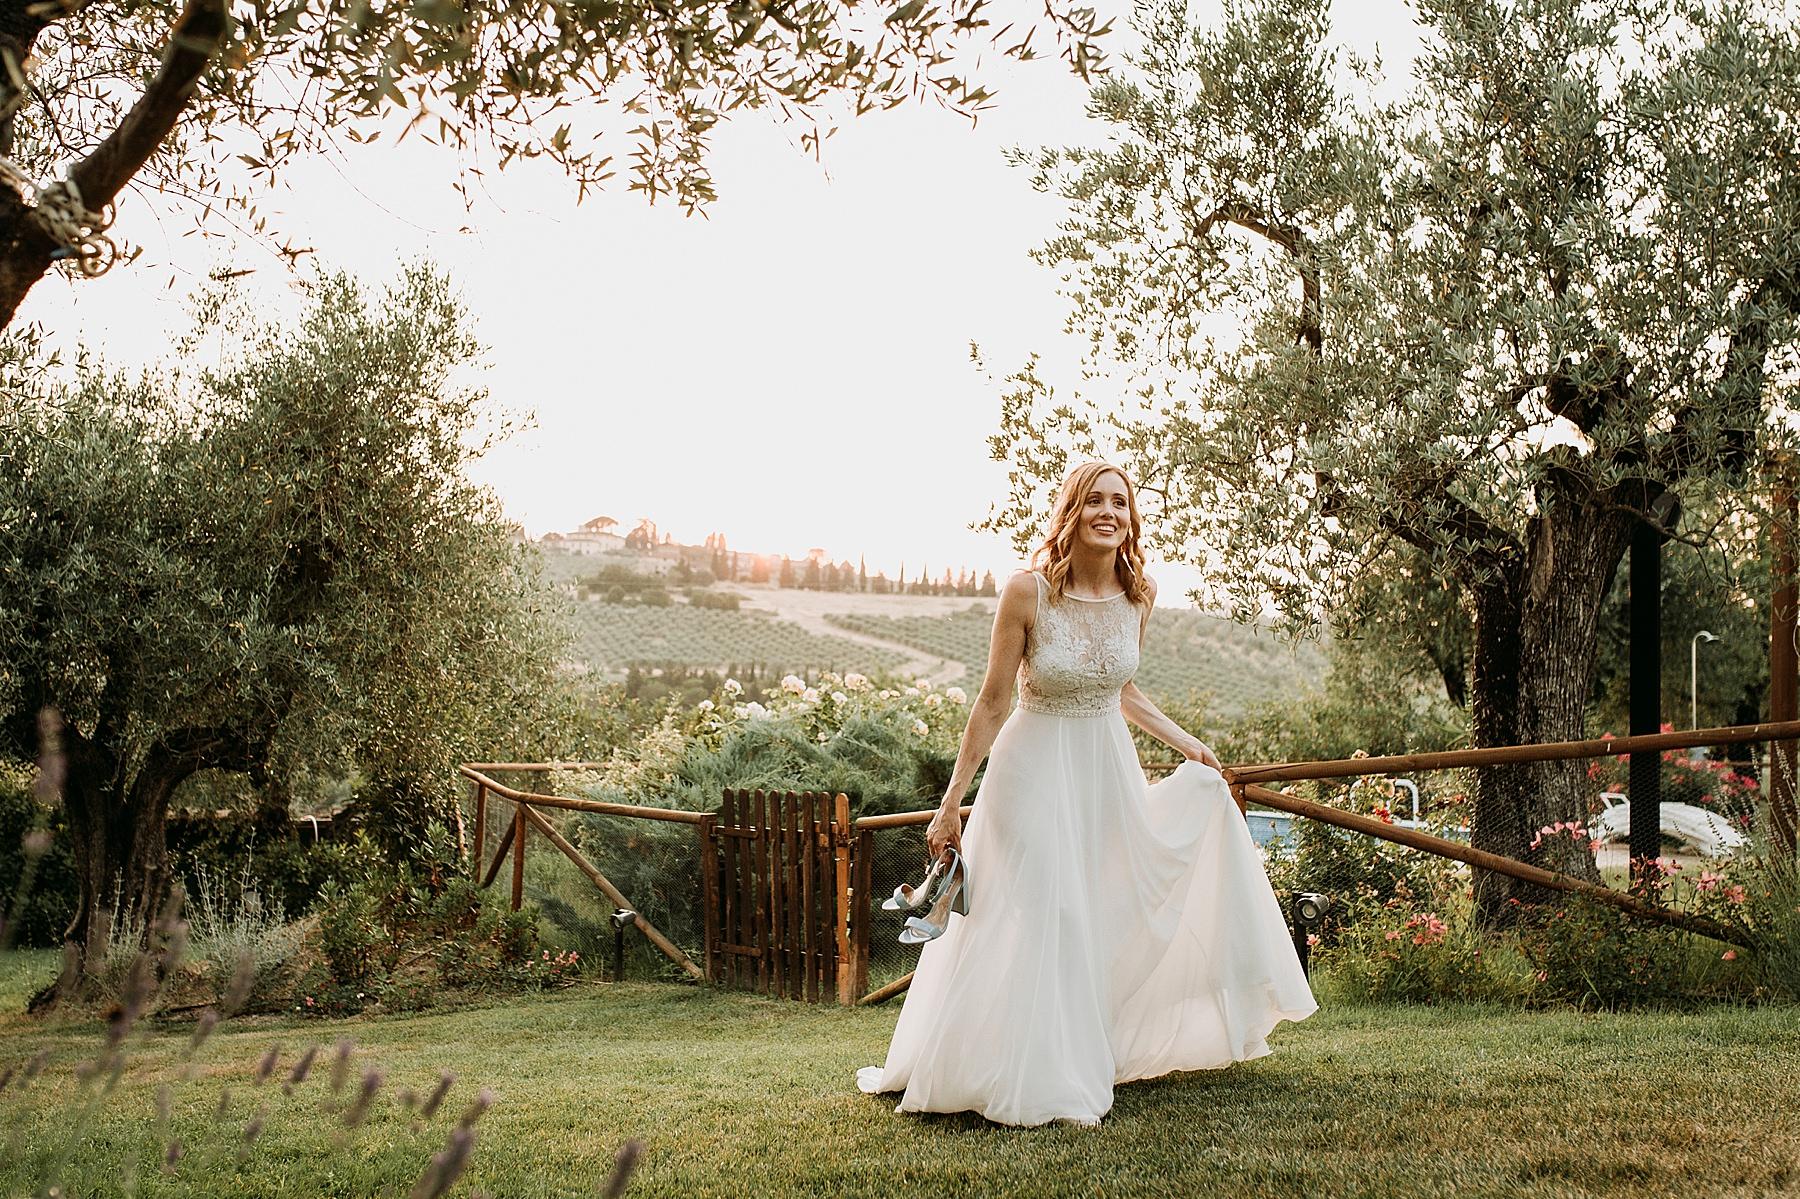 Matrimonio nel Chianti Impruneta Firenze Agriturismo I Viticci sposa